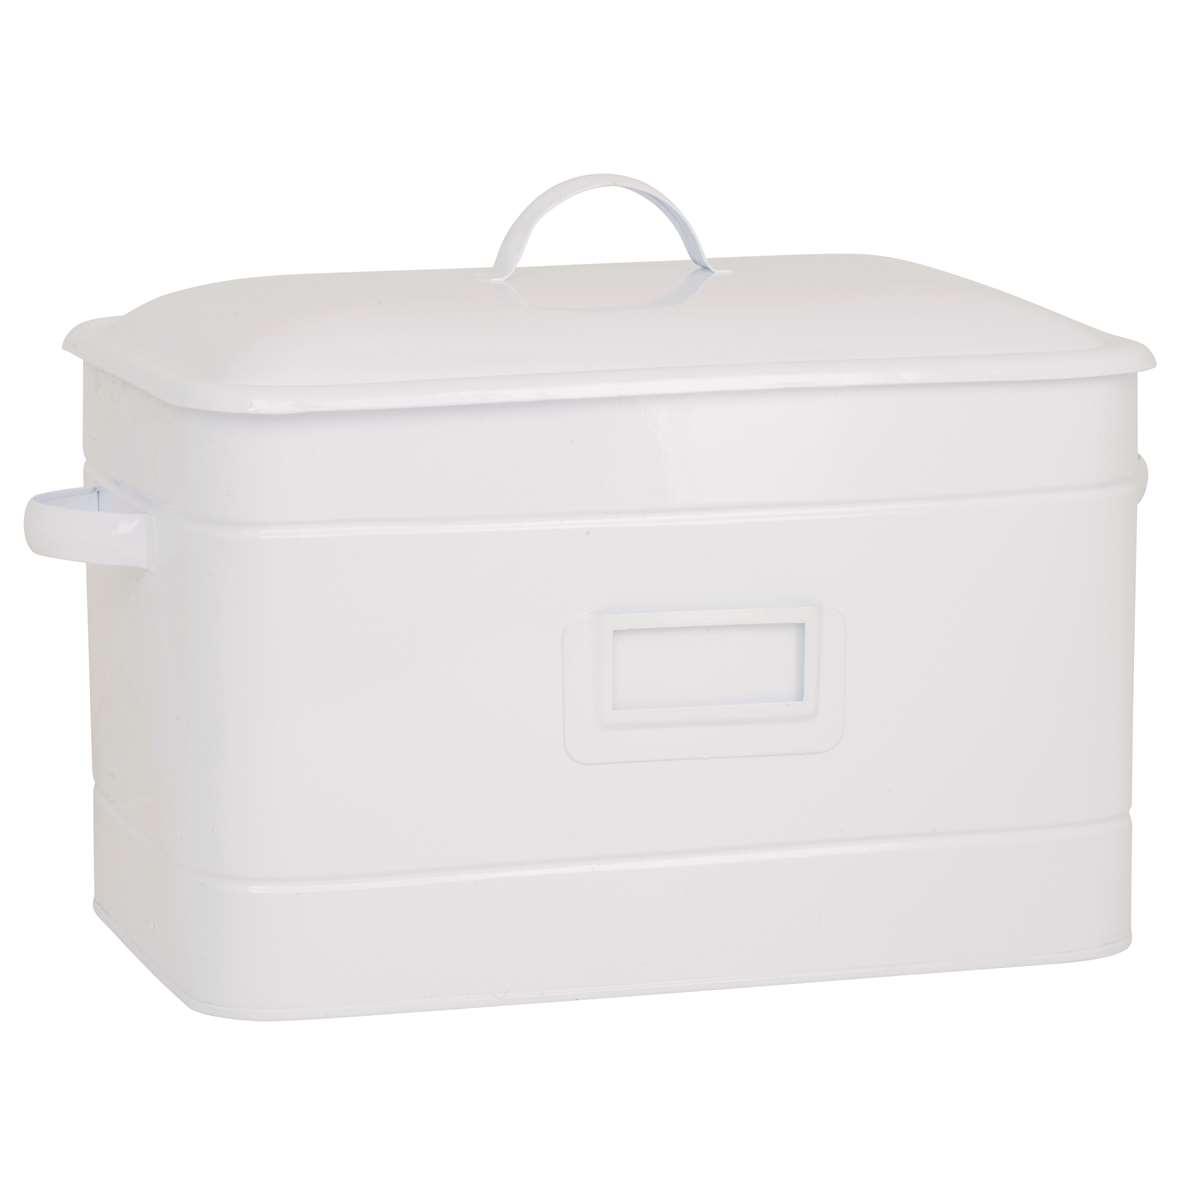 modell farbe w hlbar laursen brotkasten brotbox brottopf emaille keramik holz ebay. Black Bedroom Furniture Sets. Home Design Ideas